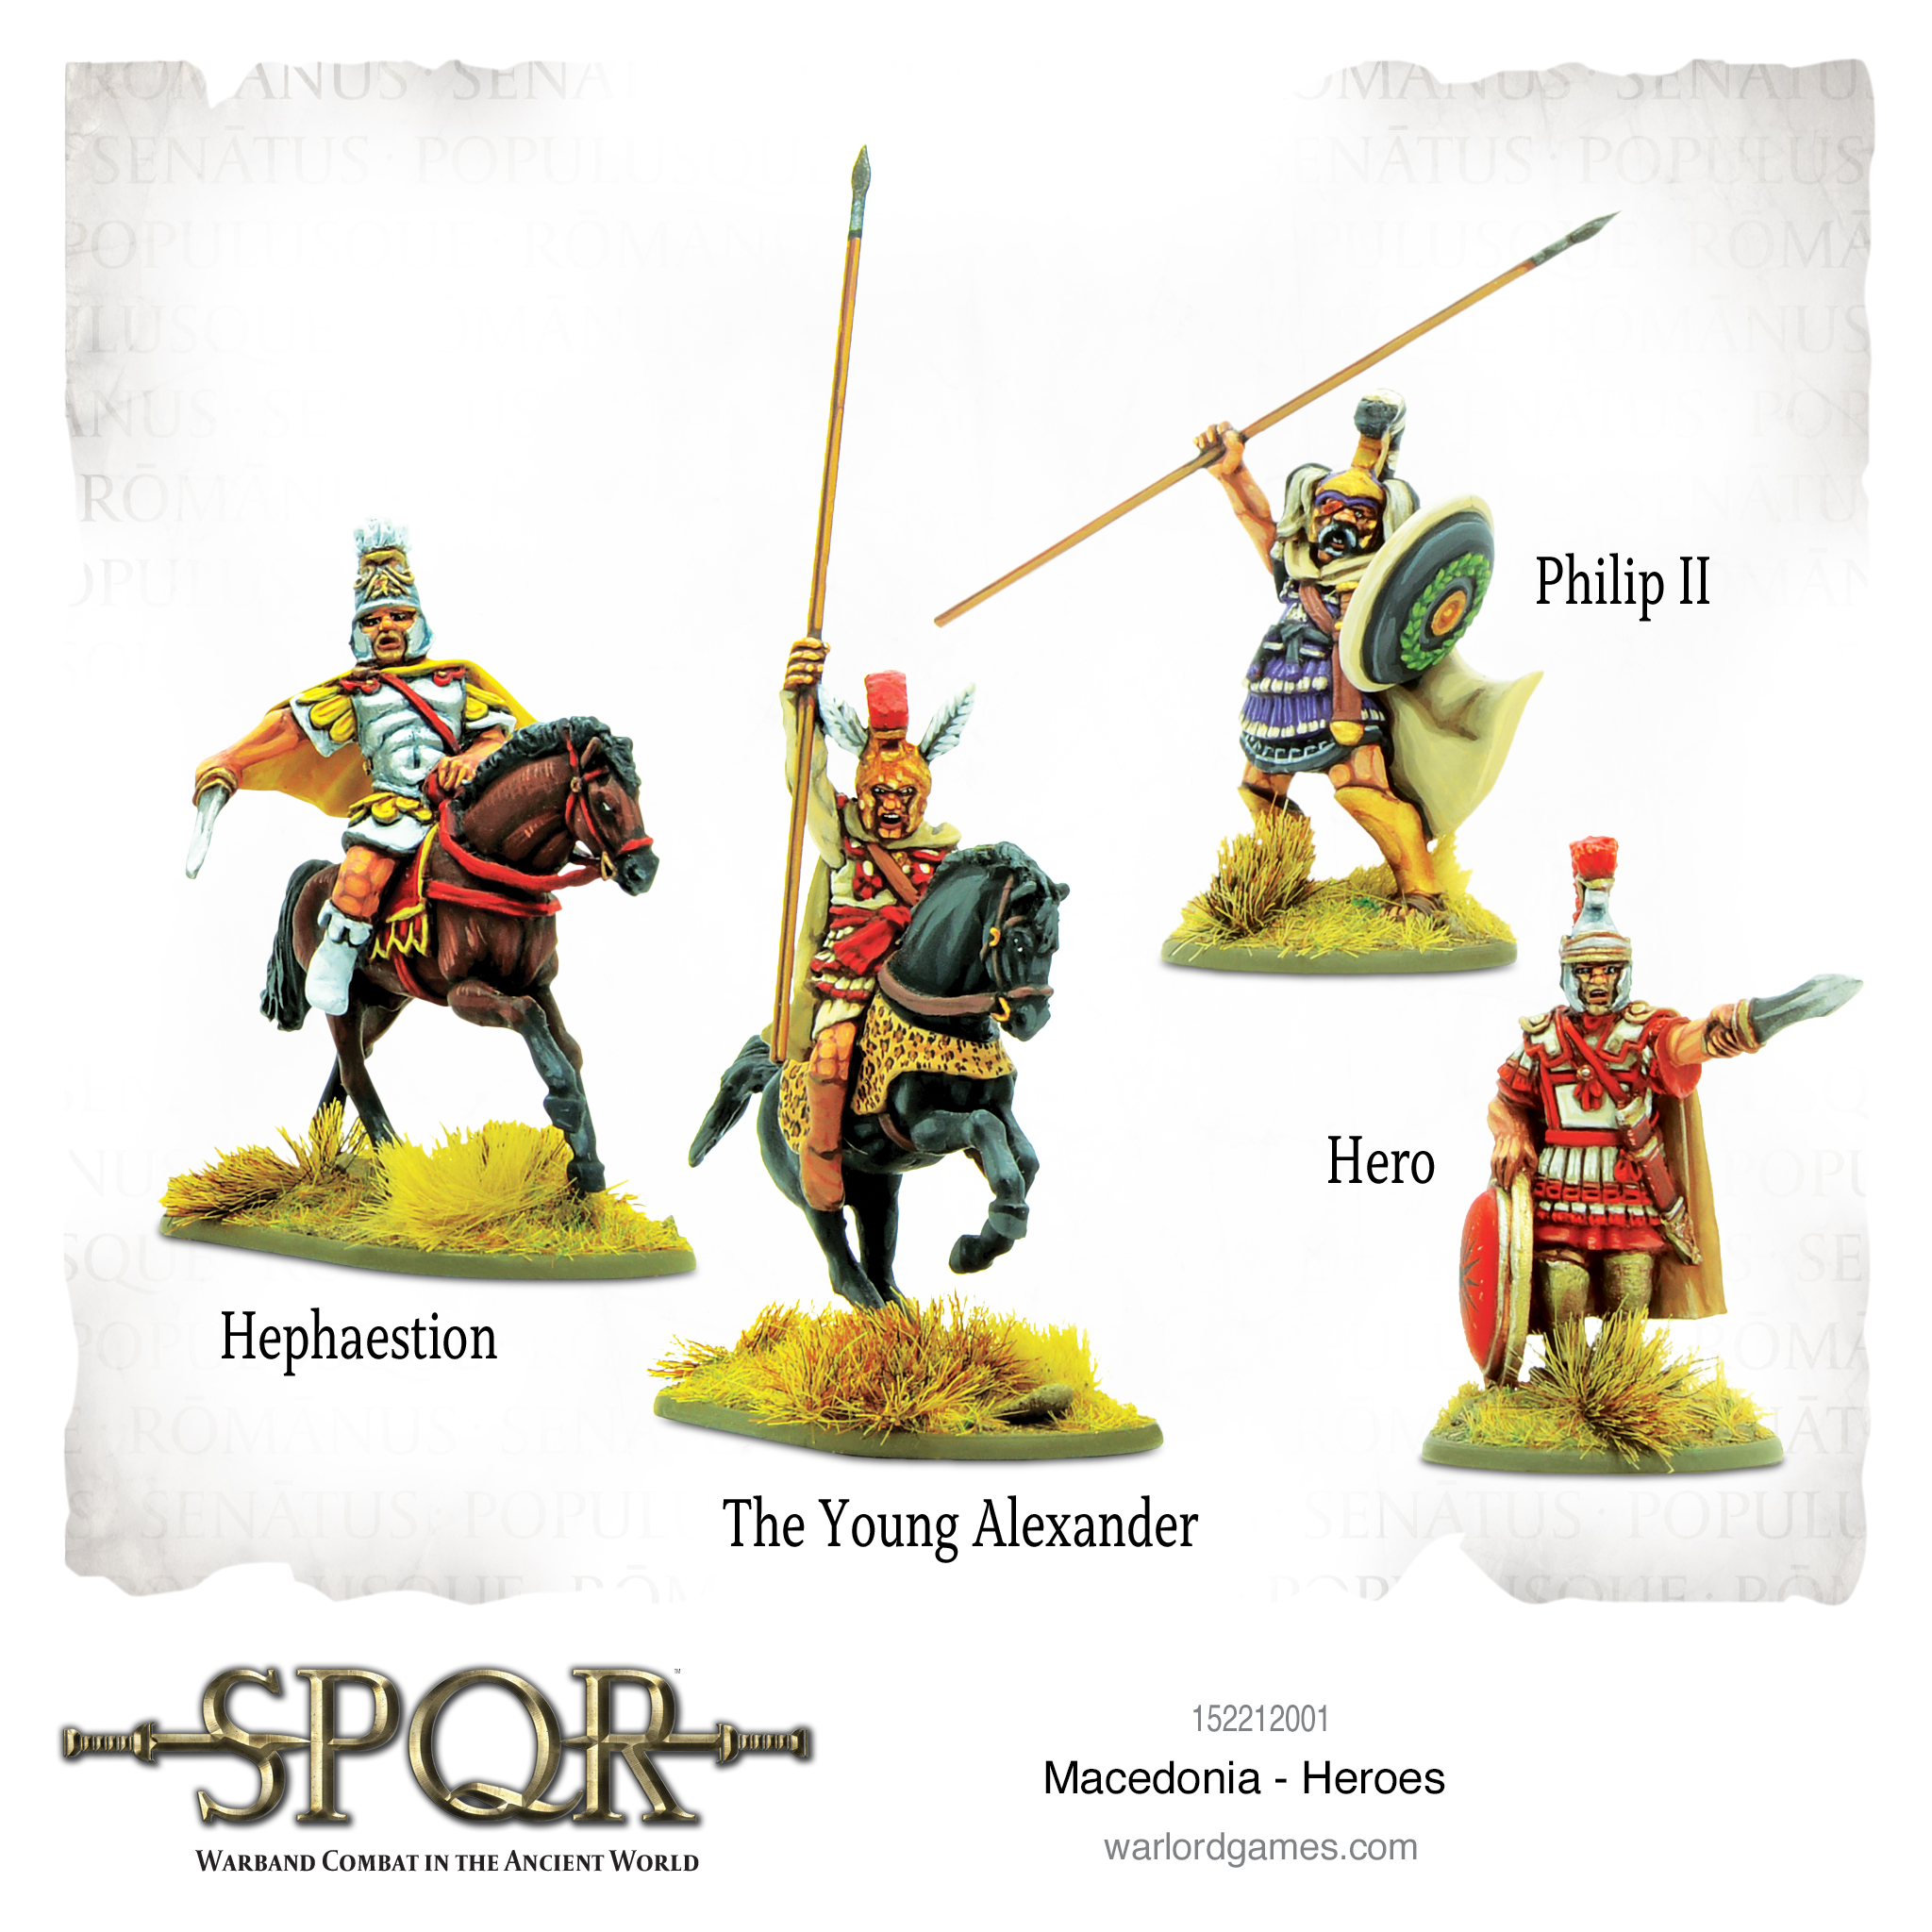 SPQR: Macedonia Heroes